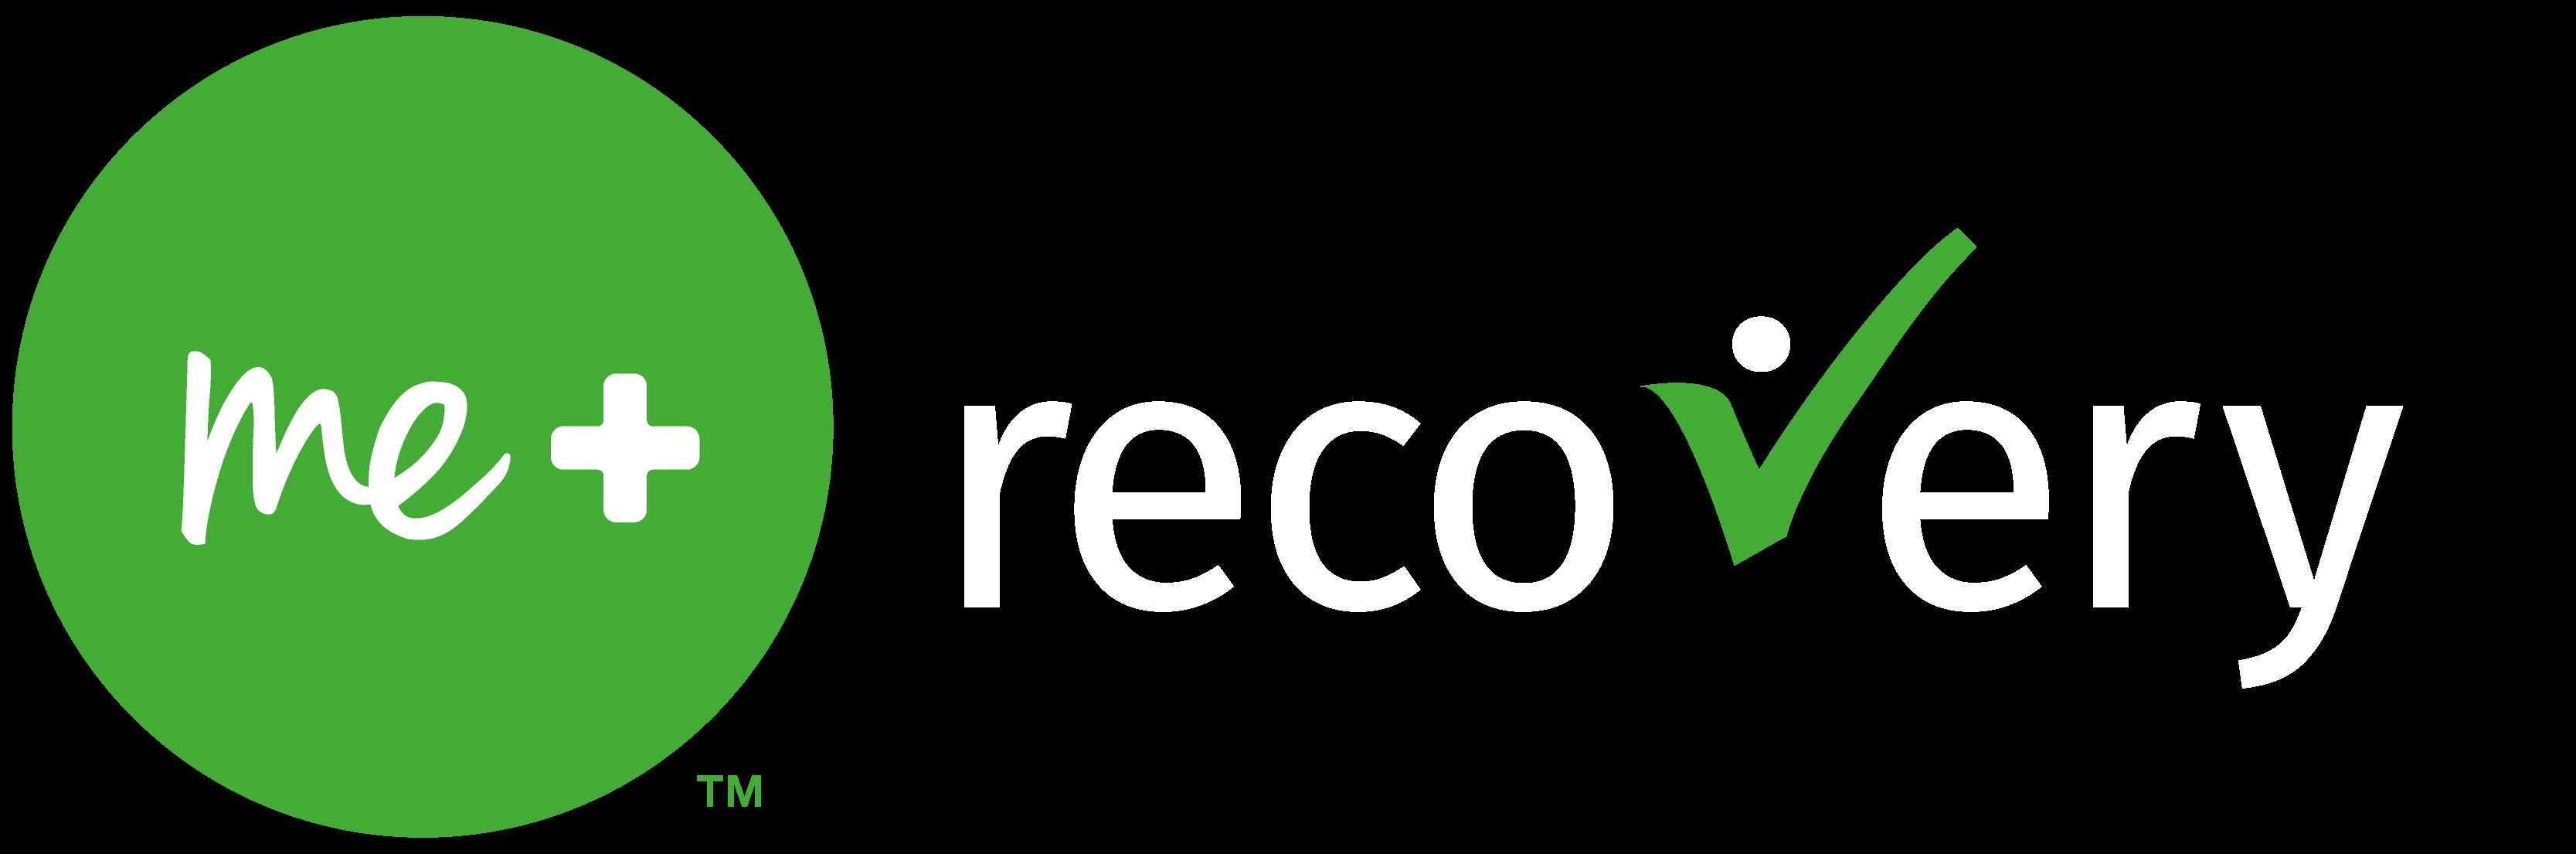 Recovery de Convatec